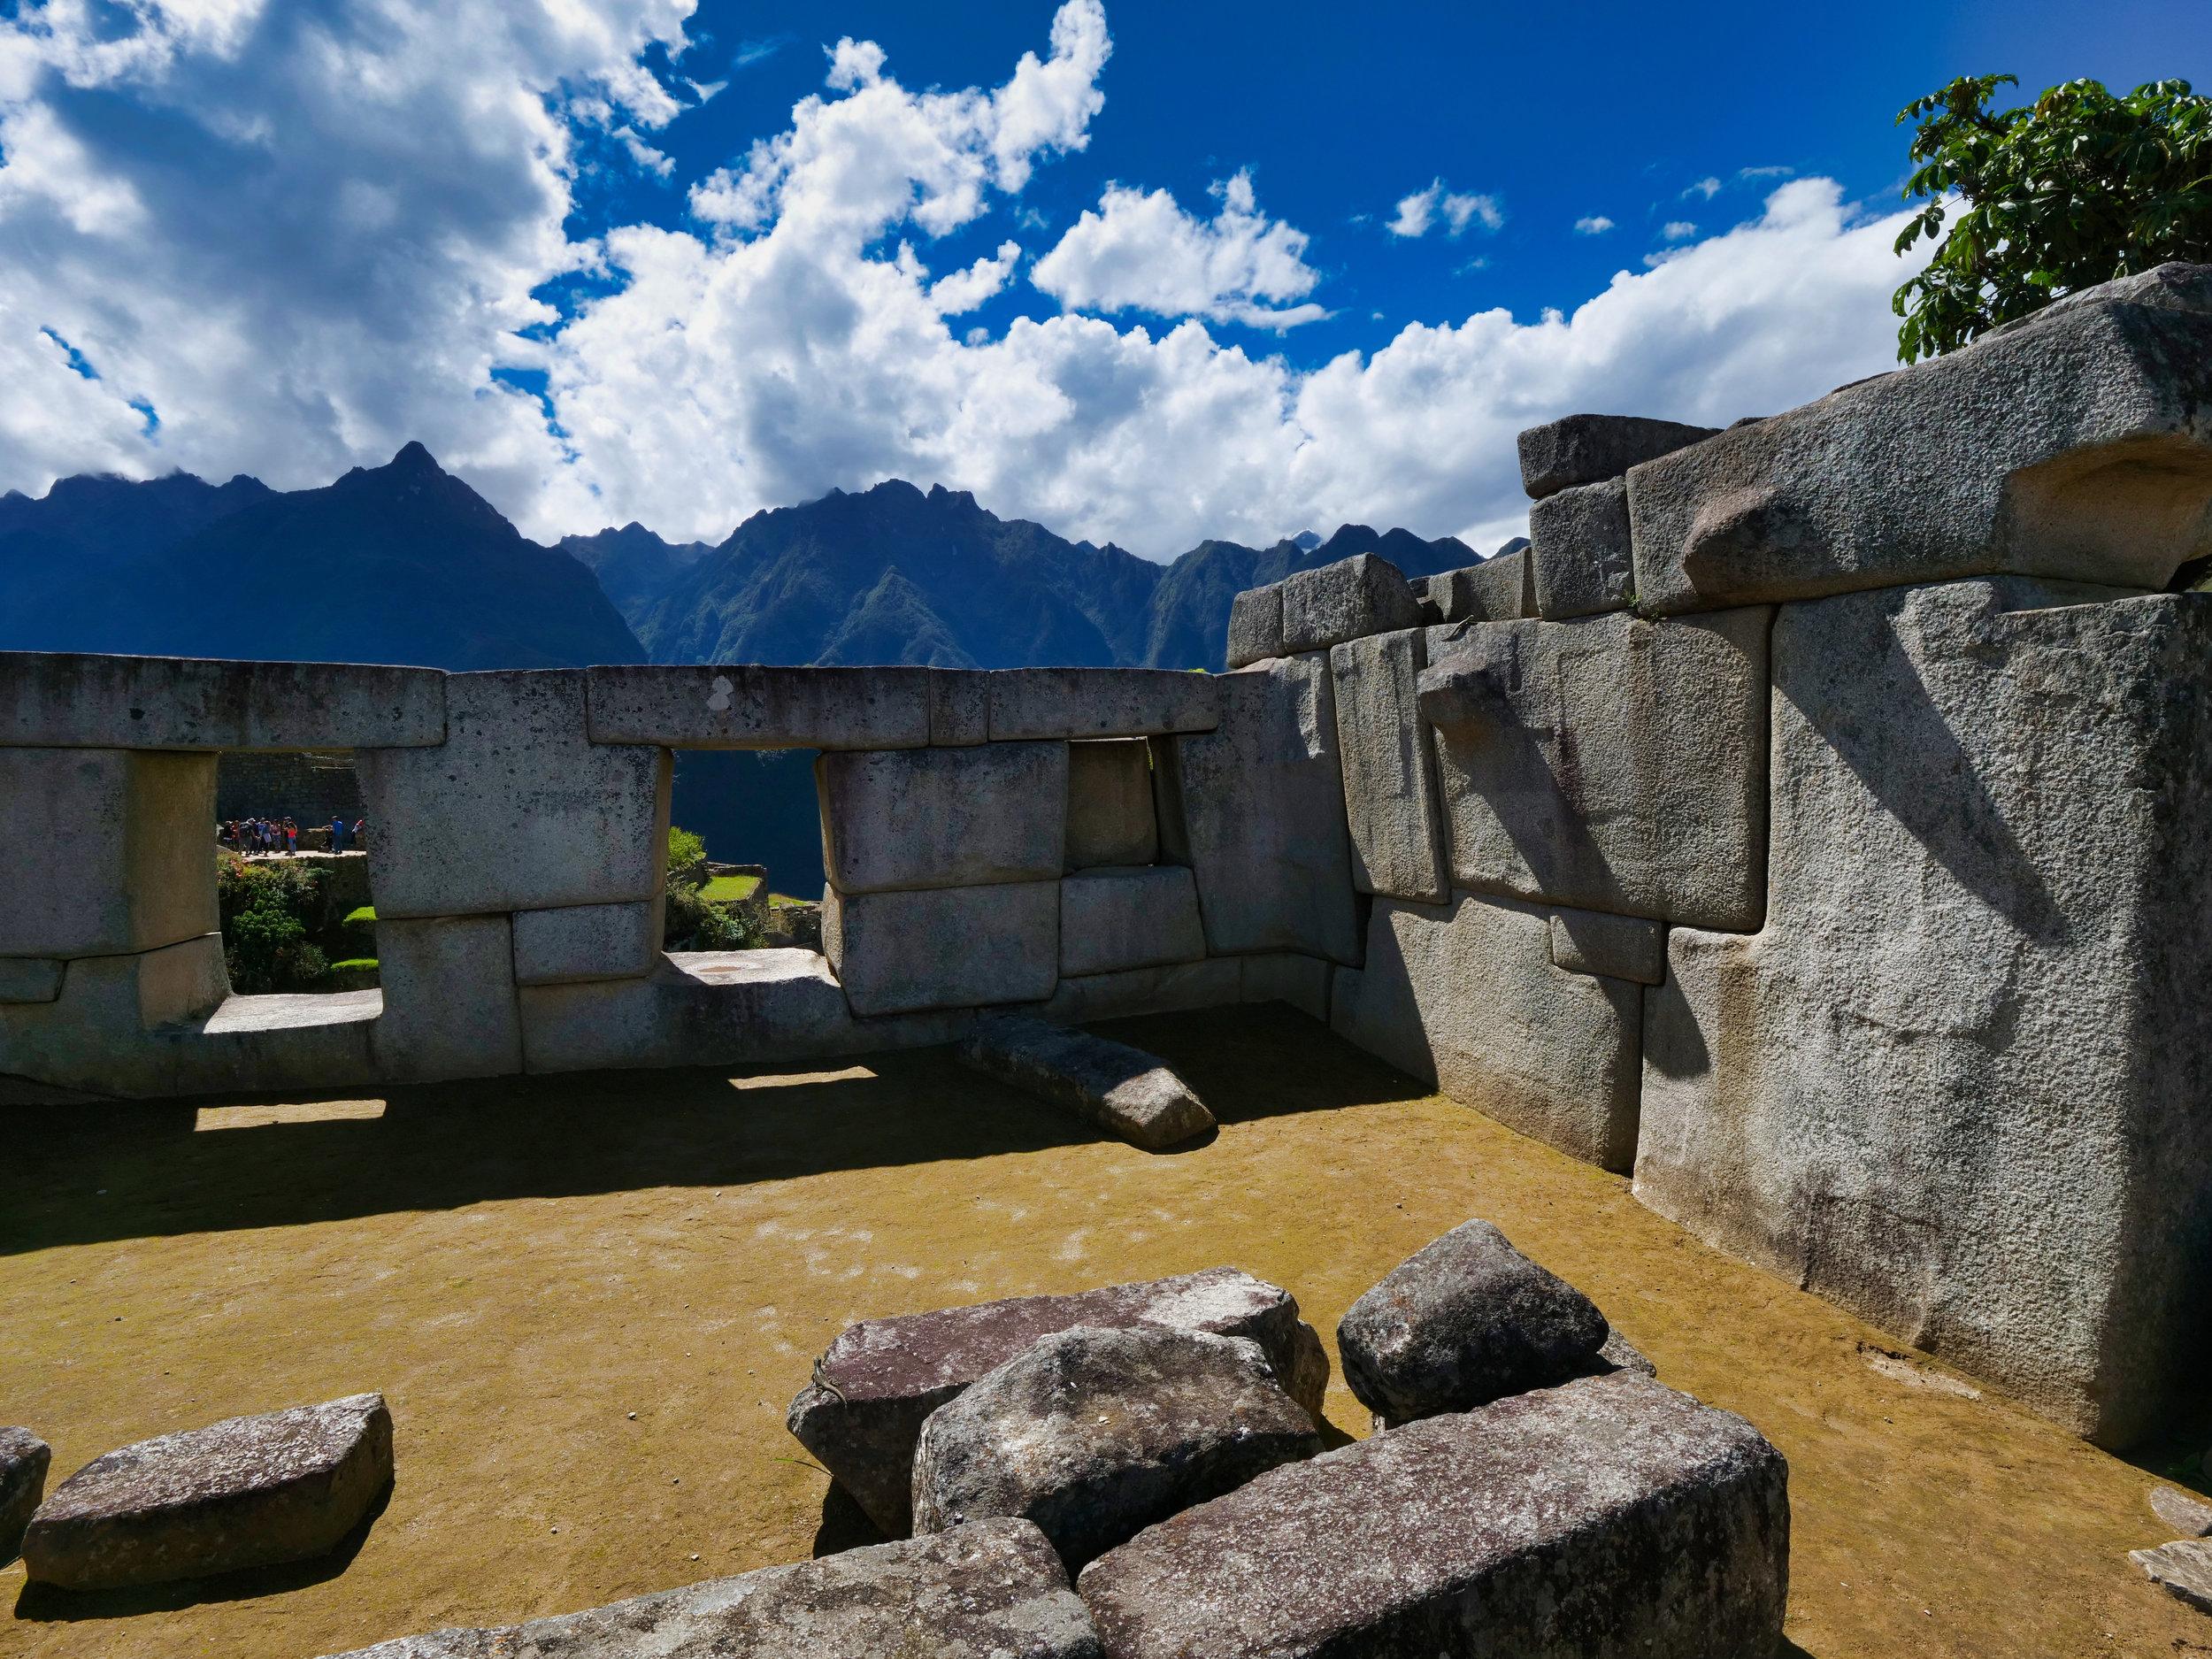 Incredible stone work at Machu Picchu